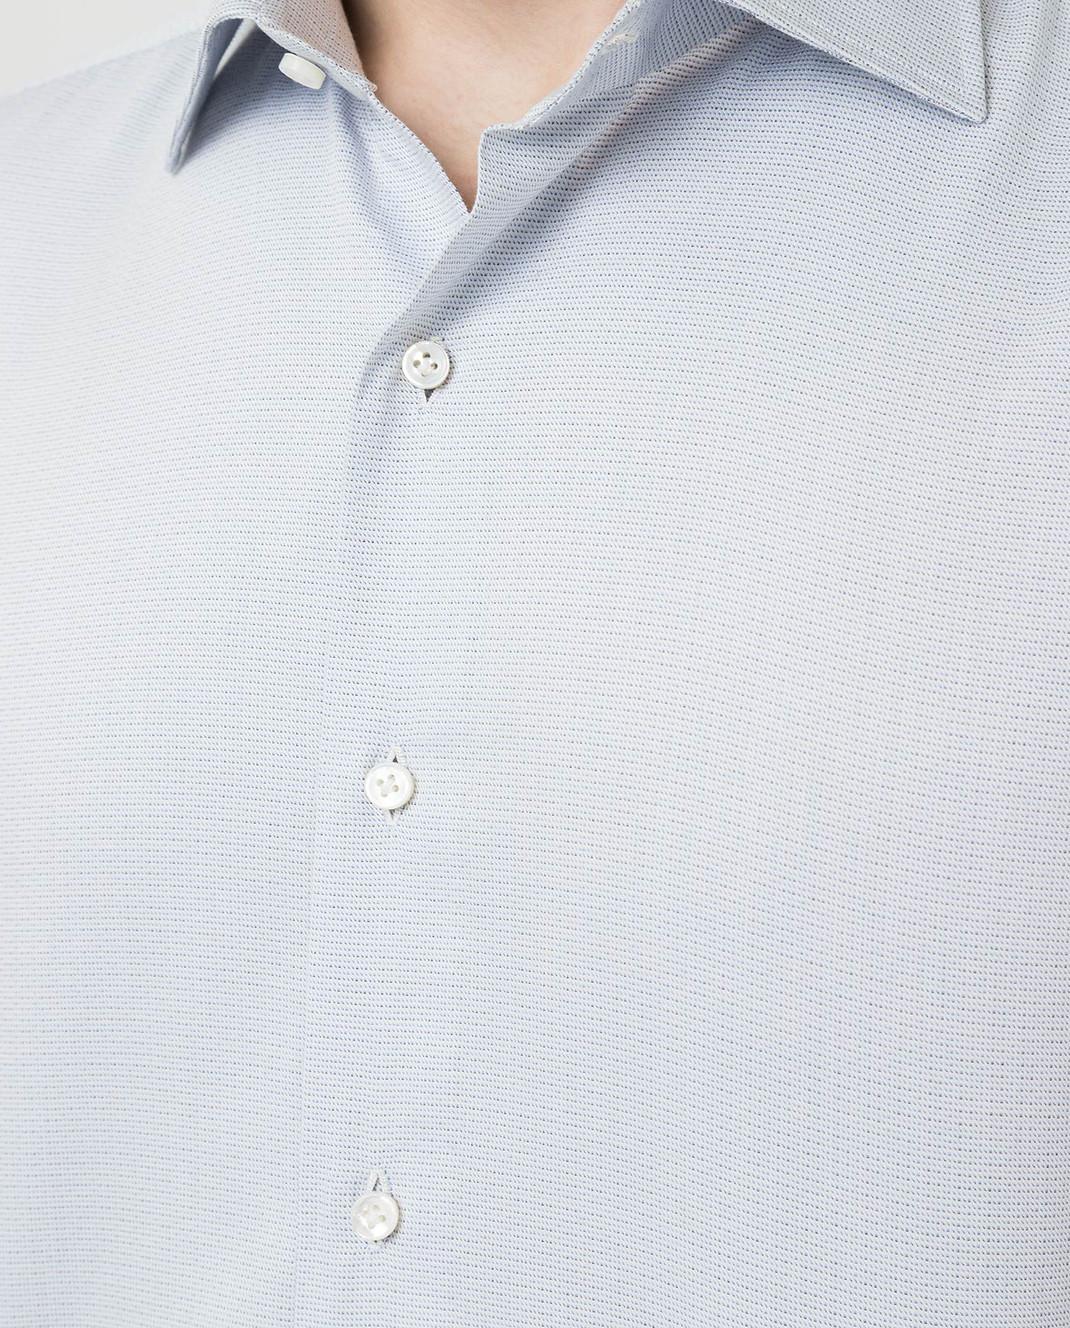 Luciano Lombardi Голубая рубашка 66216210 изображение 5